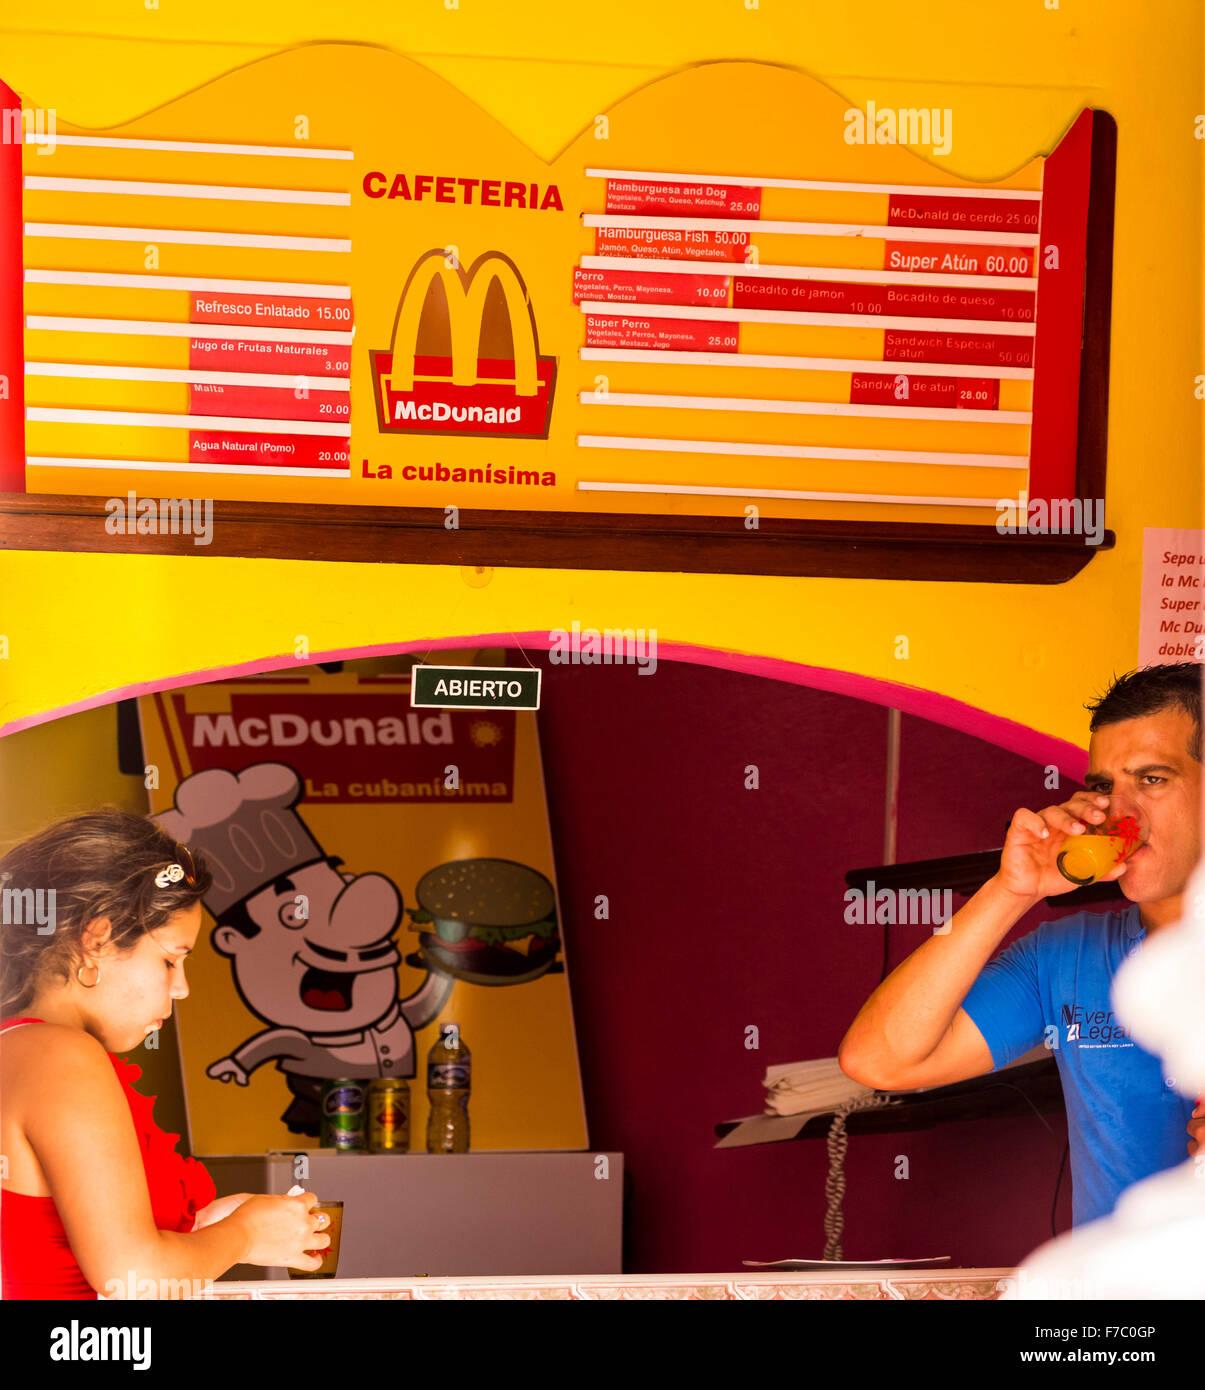 Cuban mcdonald fast food restaurant mcdonald price list family cuban mcdonald fast food restaurant mcdonald price list family father and daughter streetlife in the center of santa clara altavistaventures Images